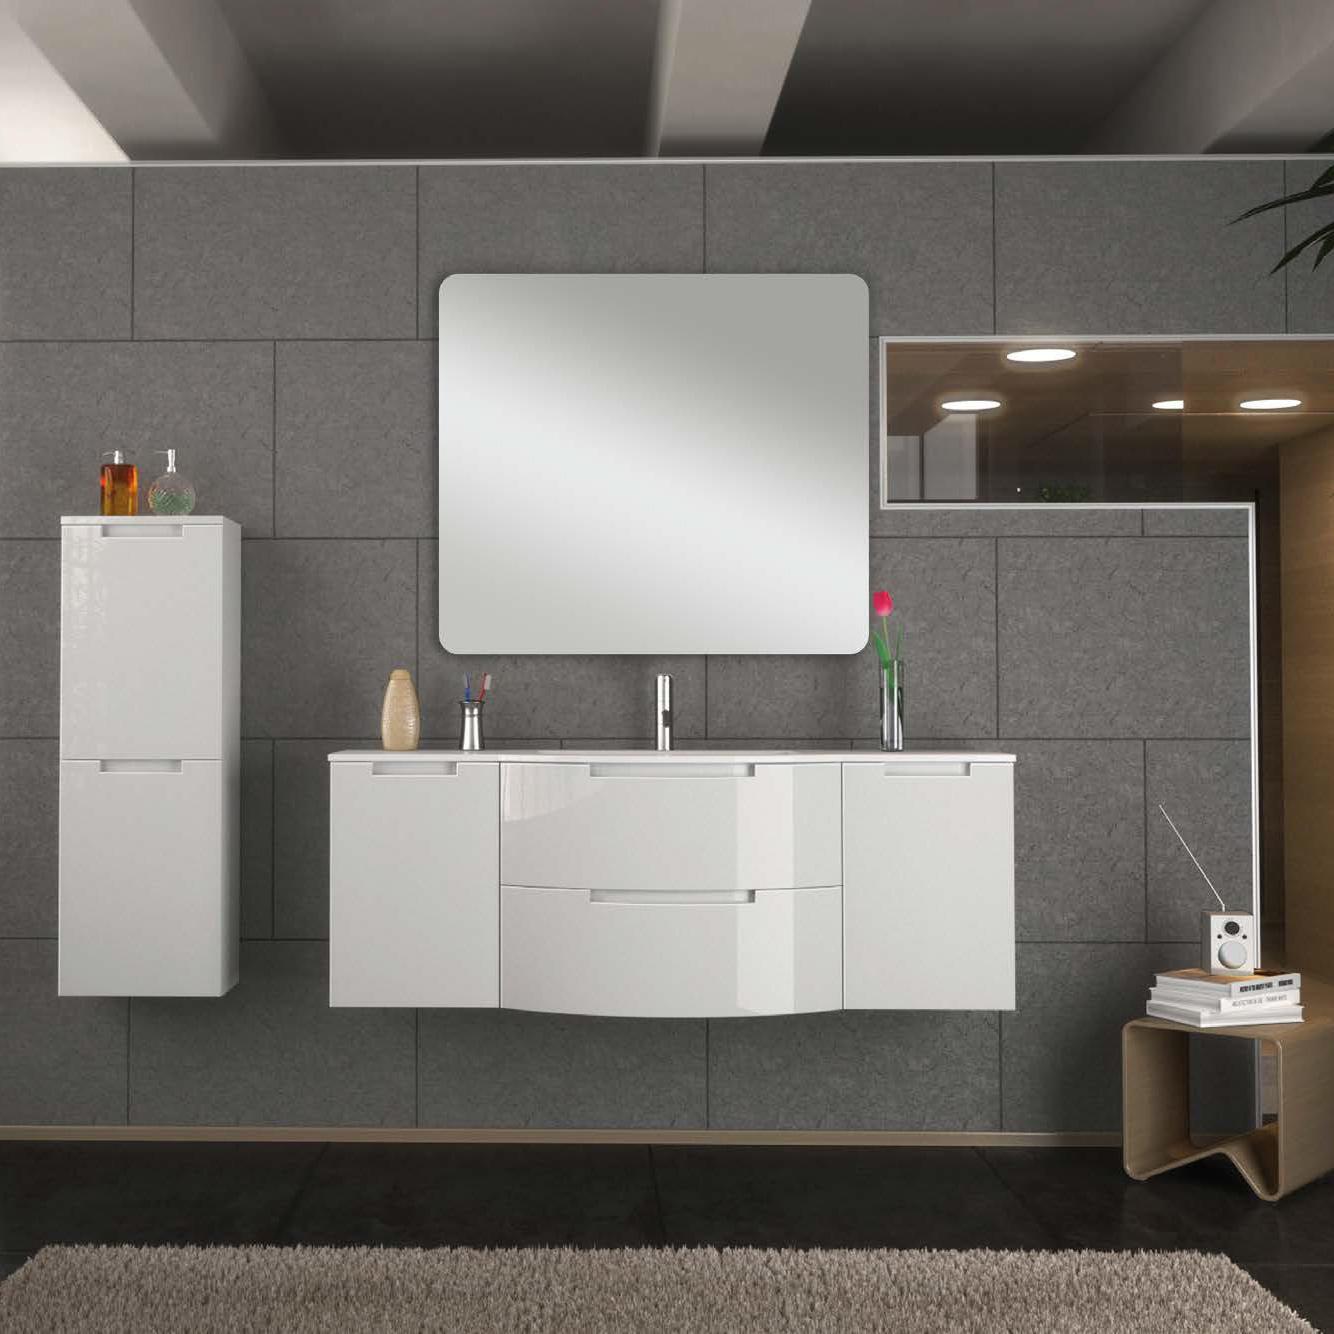 57 inch Modern Floating Bathroom Vanity Black Glossy Finish